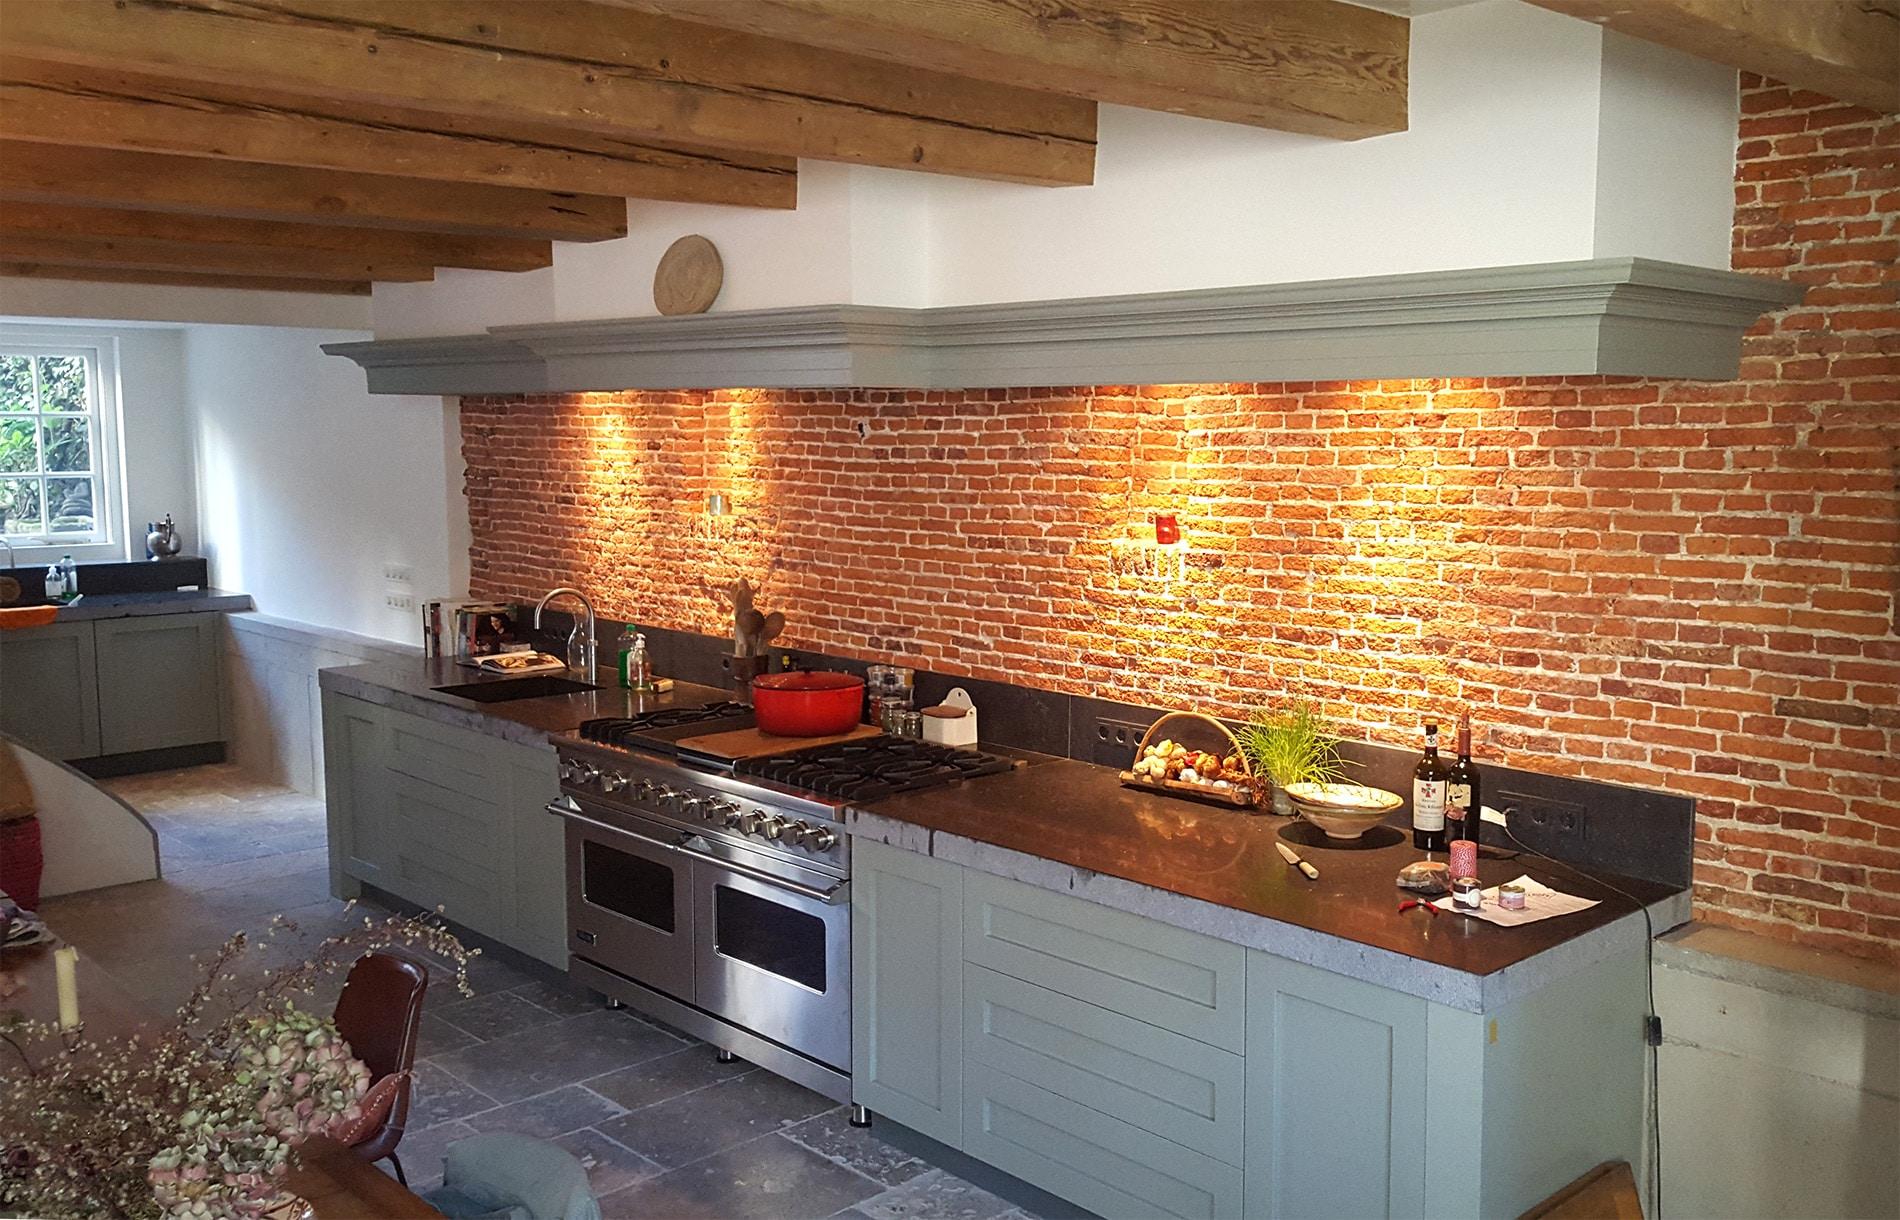 nielsmaakt-keuken-klassiek-modern-01